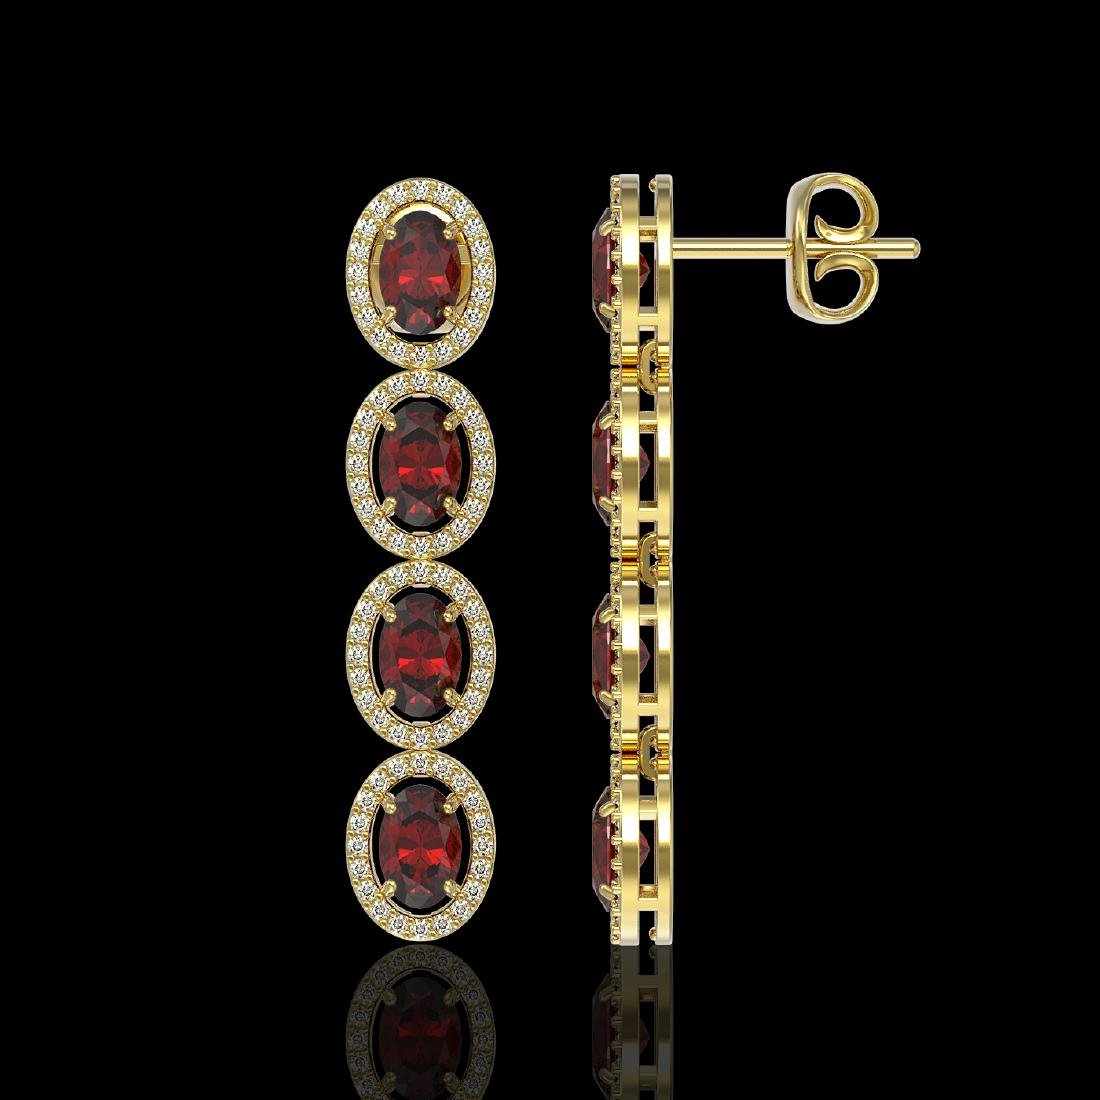 6.2 CTW Garnet & Diamond Halo Earrings 10K Yellow Gold - 2